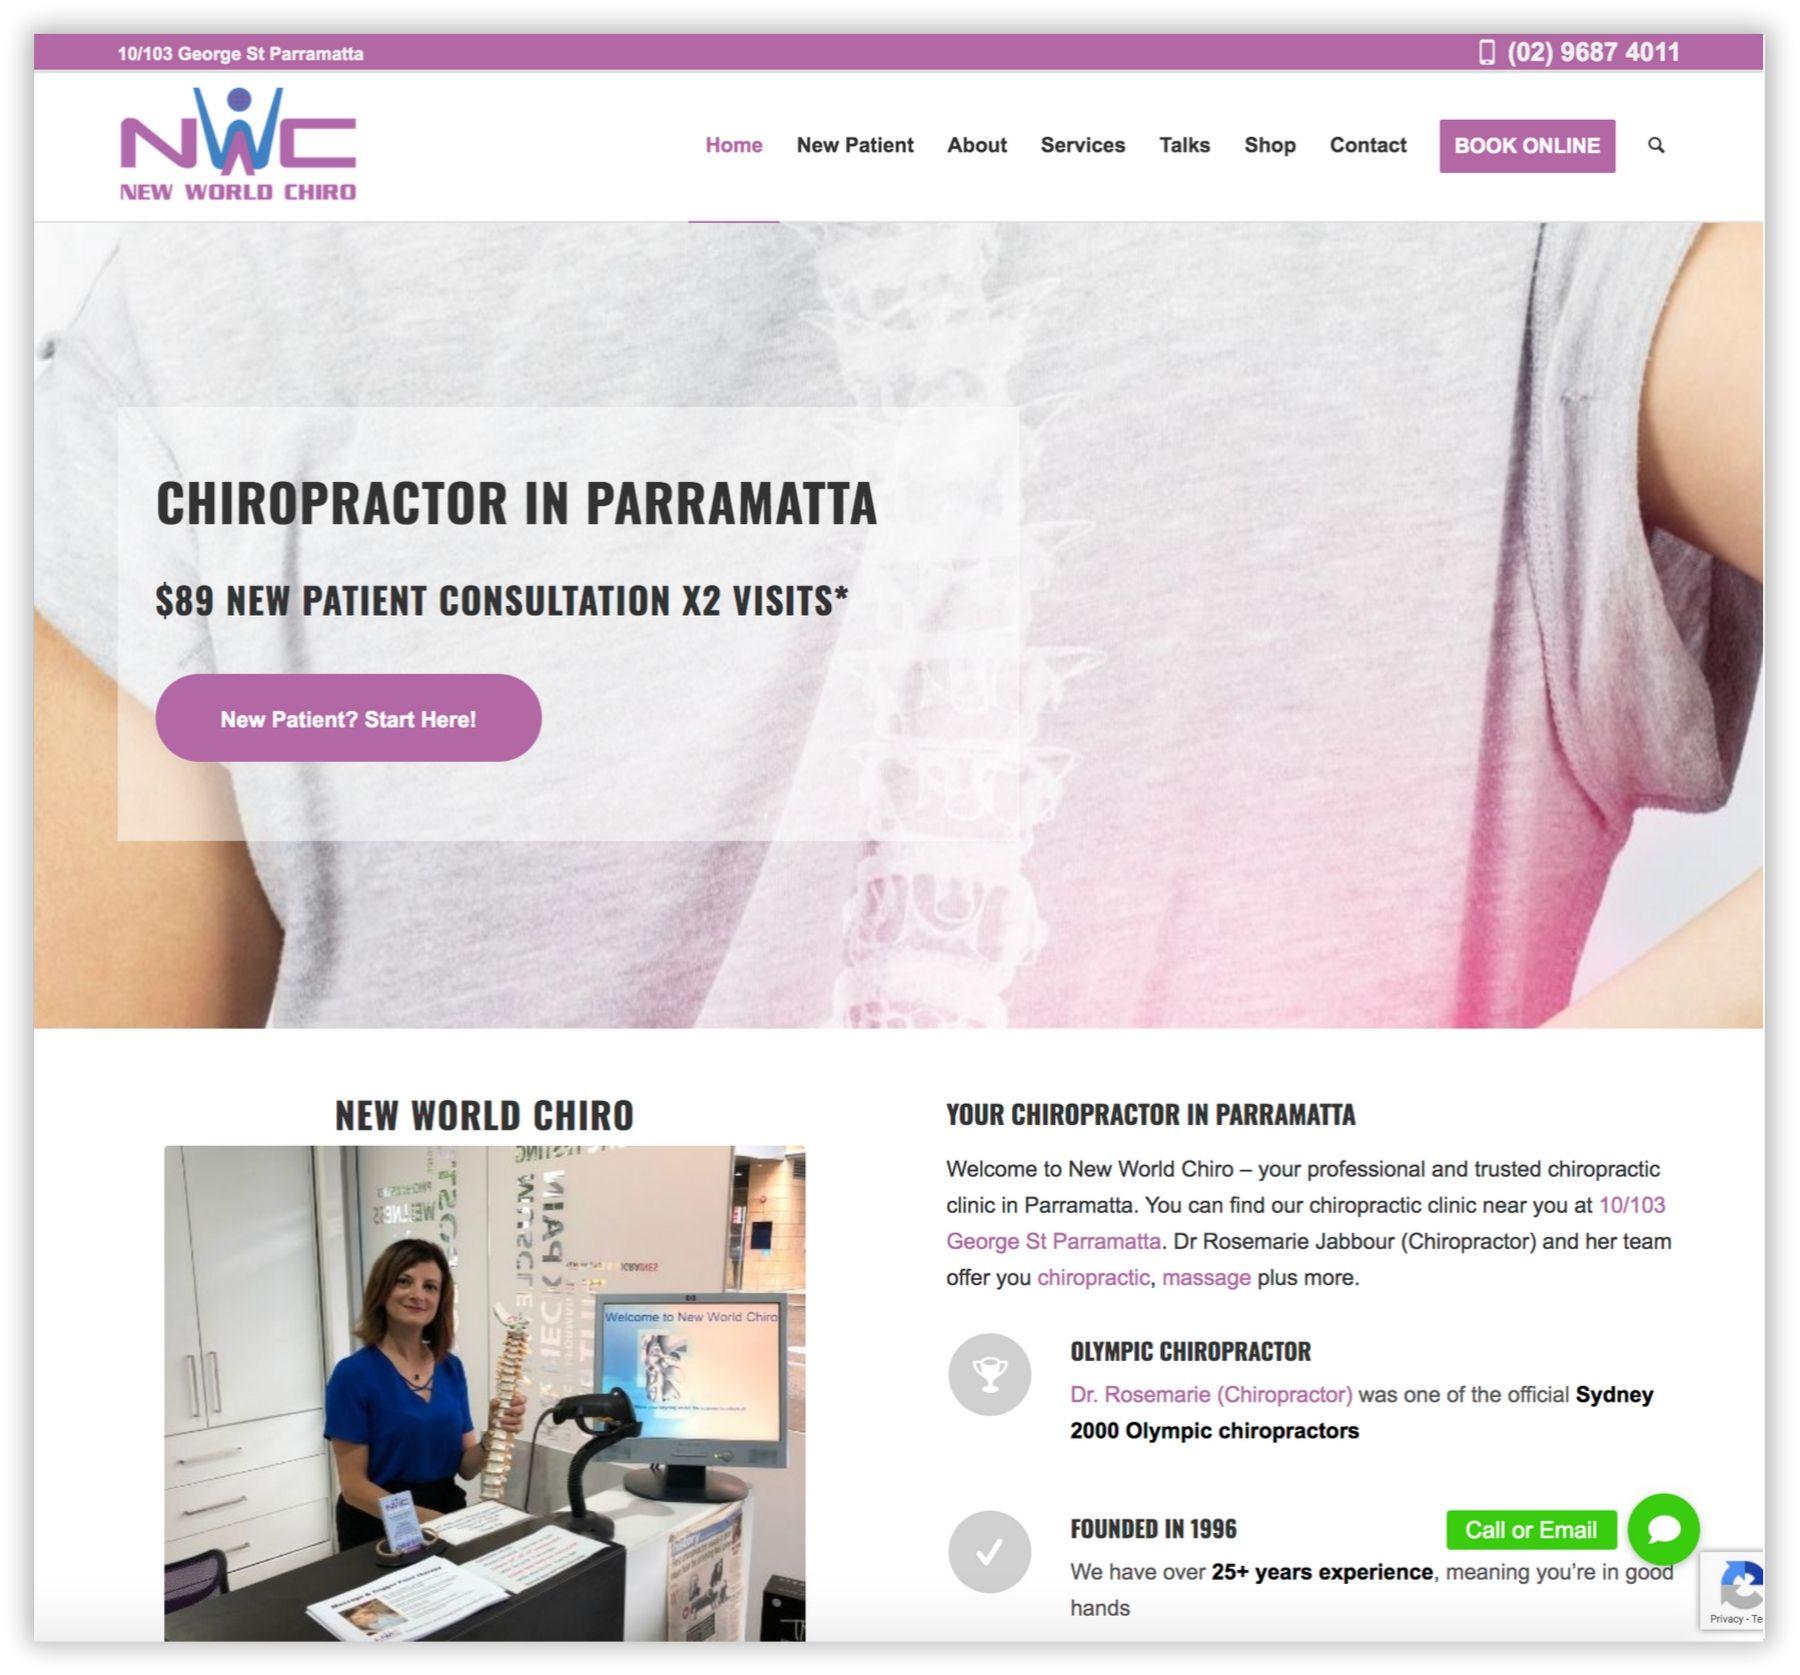 nwc-home